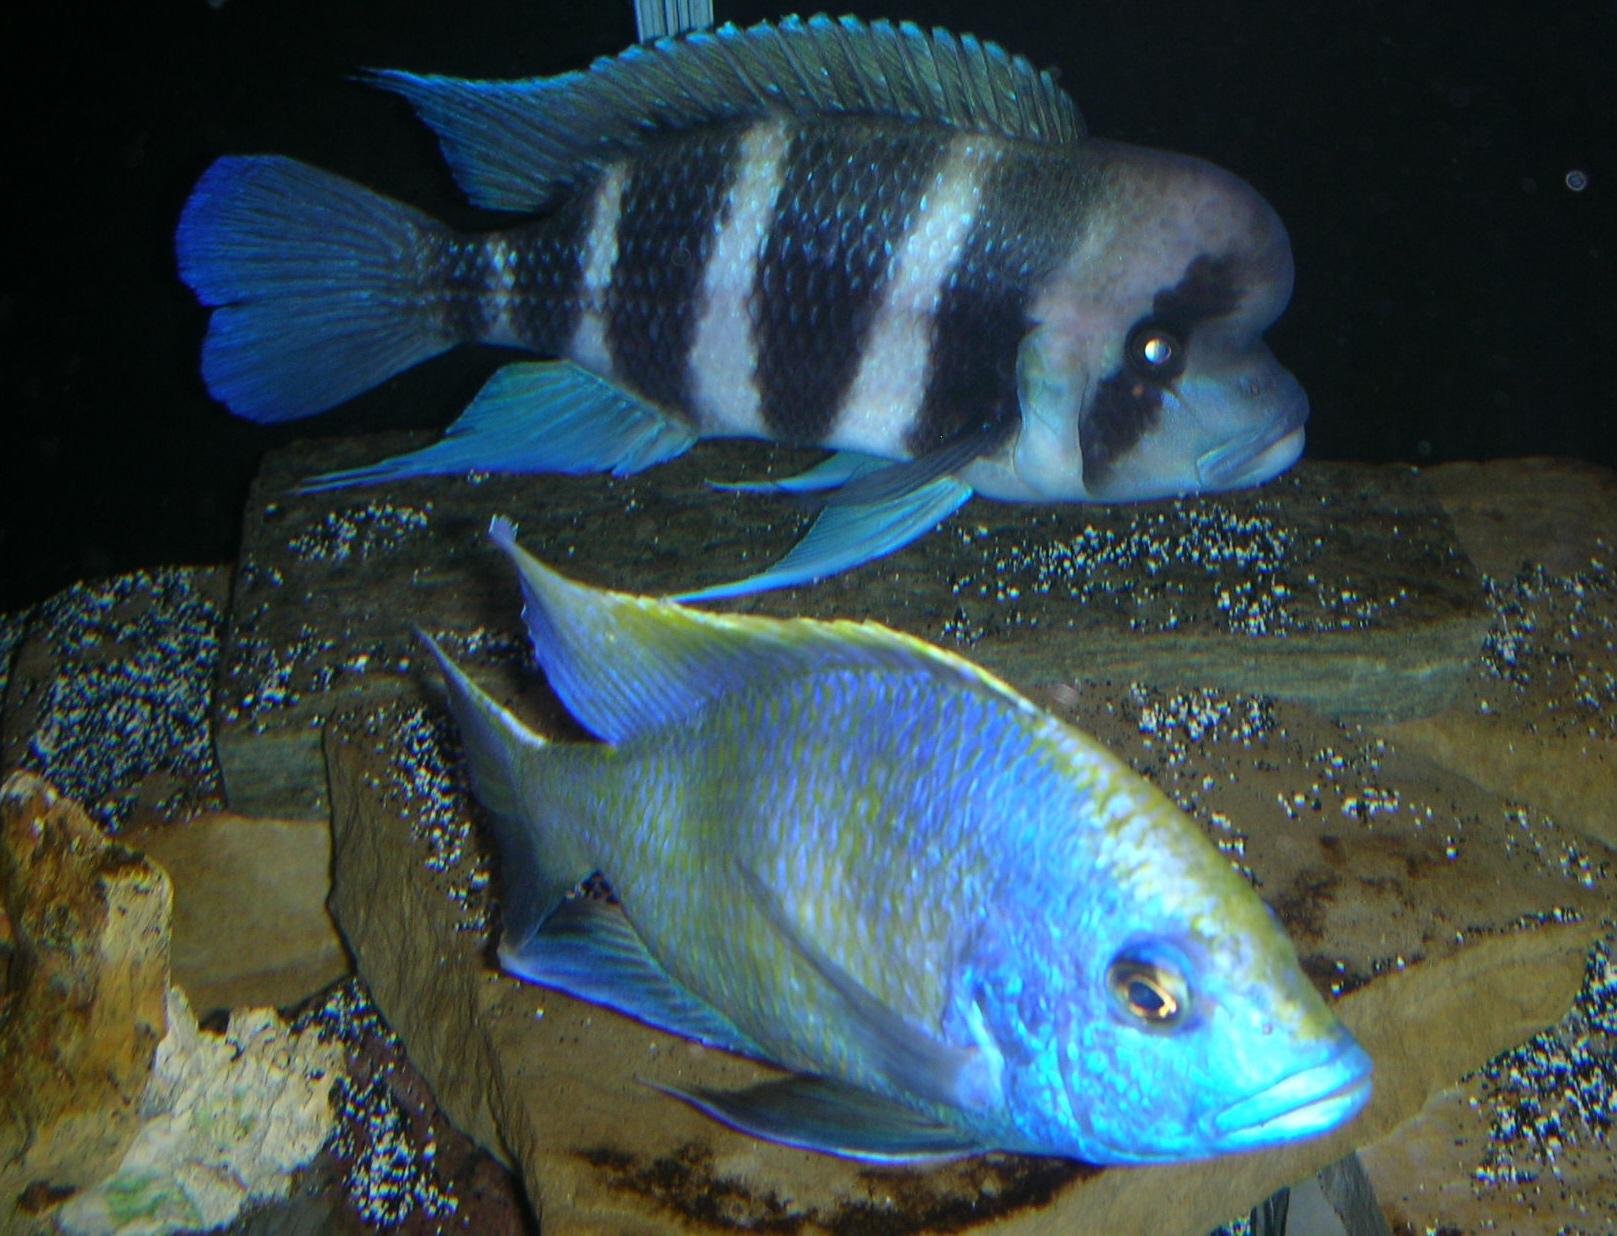 cichlids.com: Frontosa & Venustus